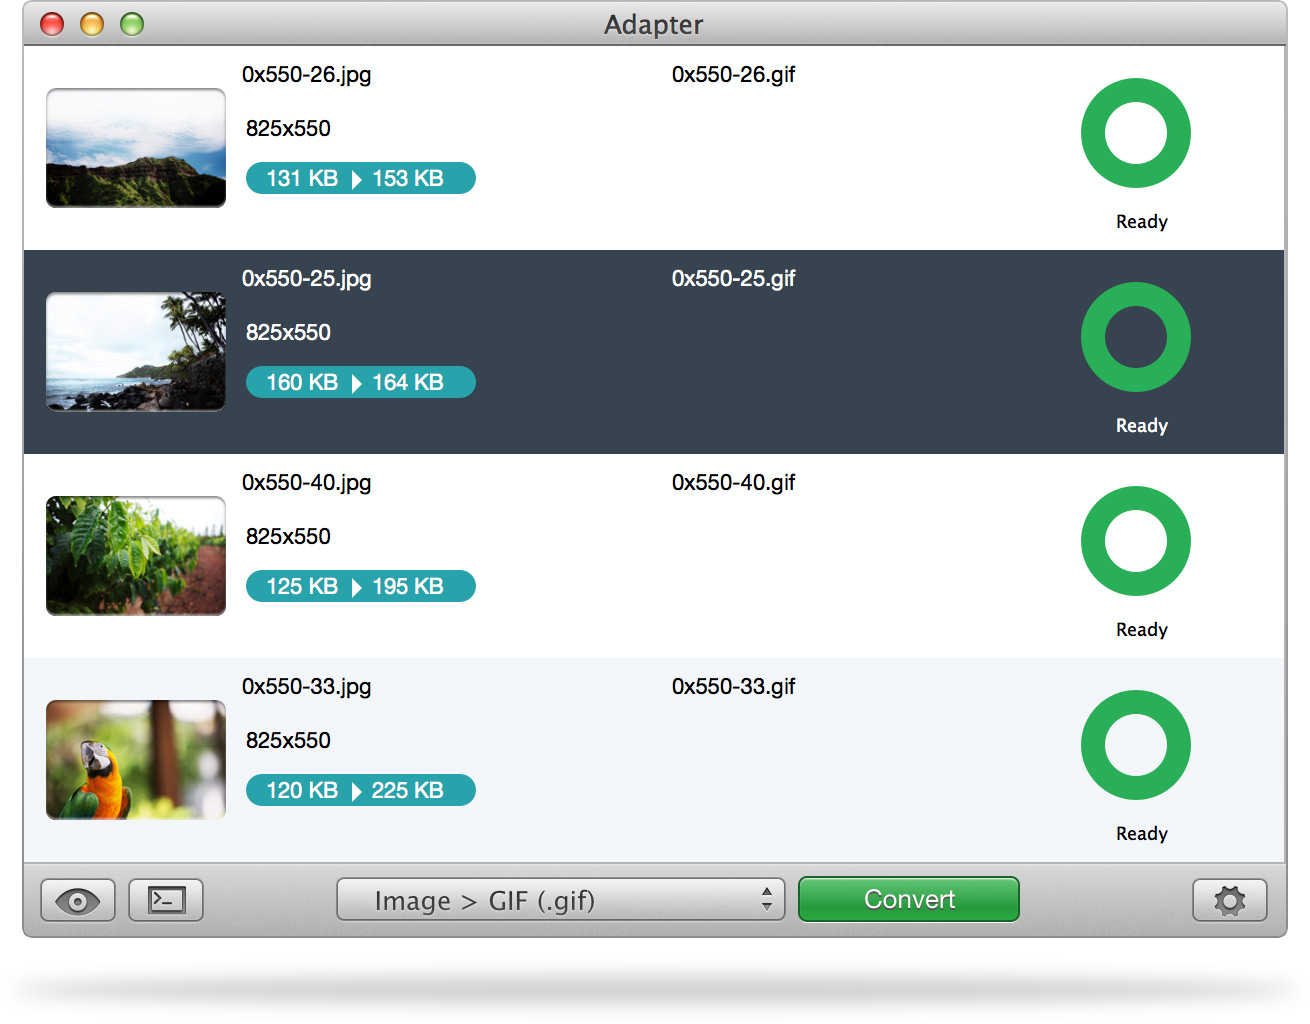 Adapter image converter software DigitalMediaGlobe